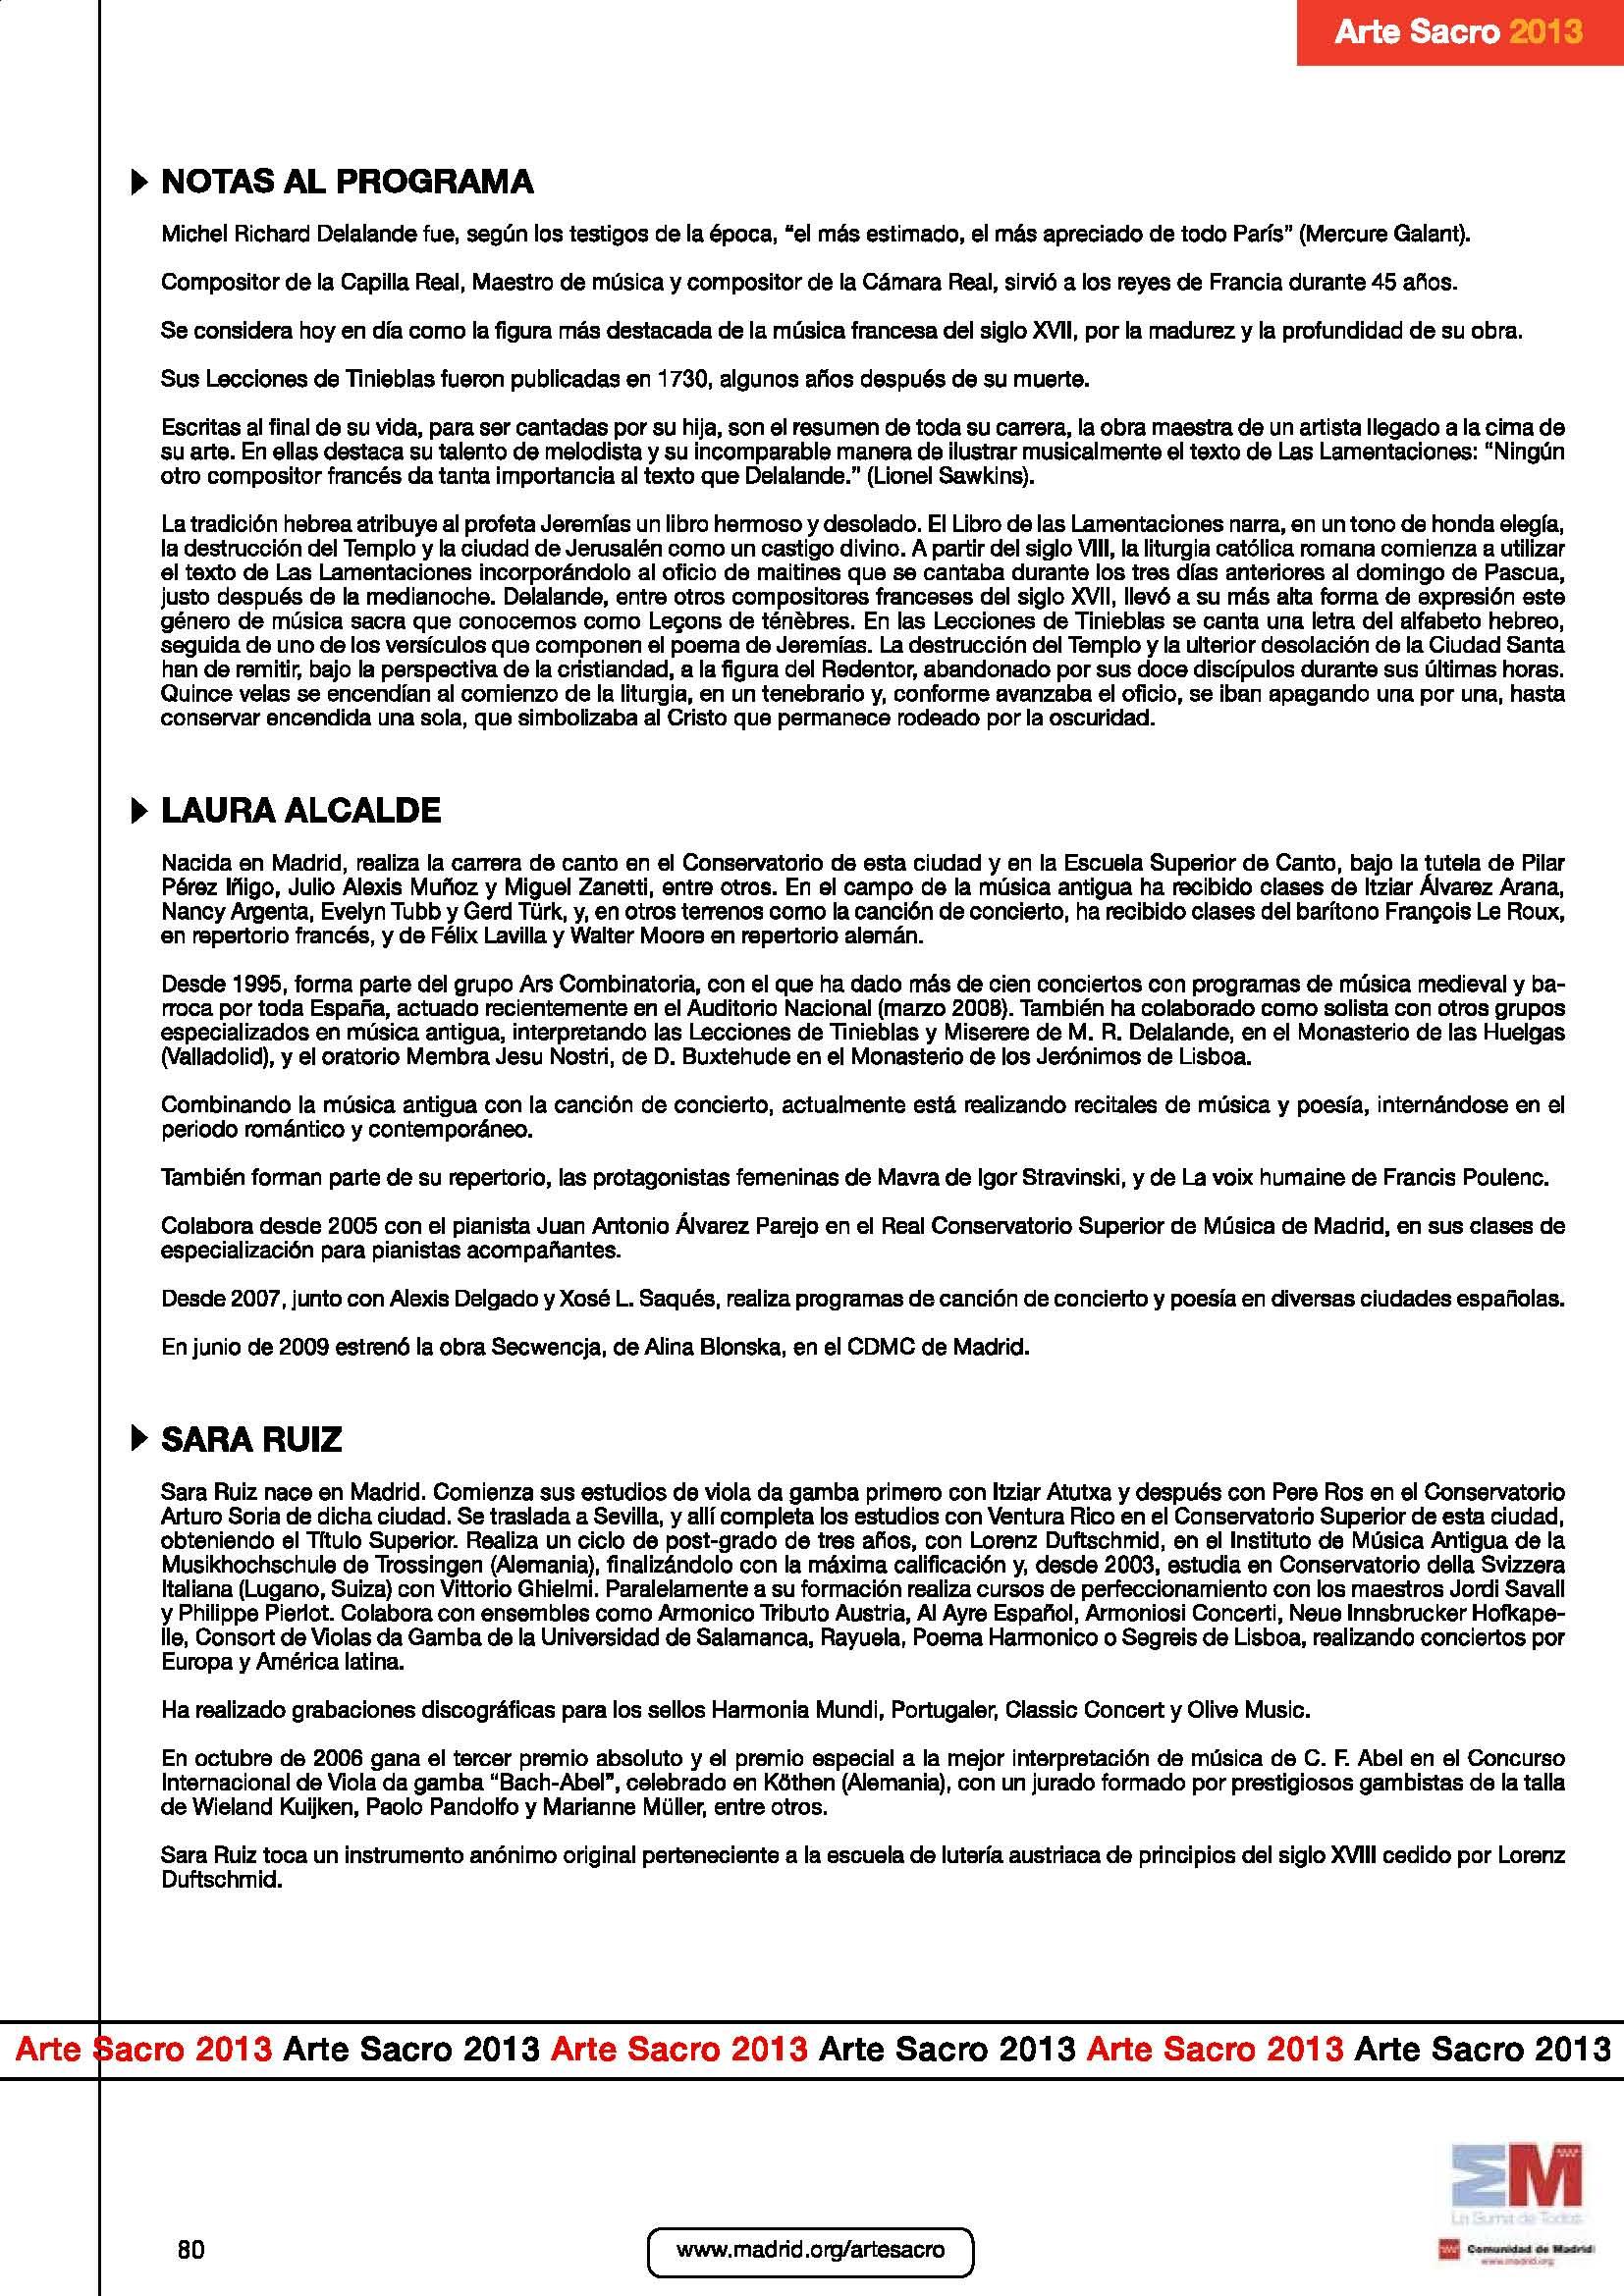 dossier_completo_Página_080